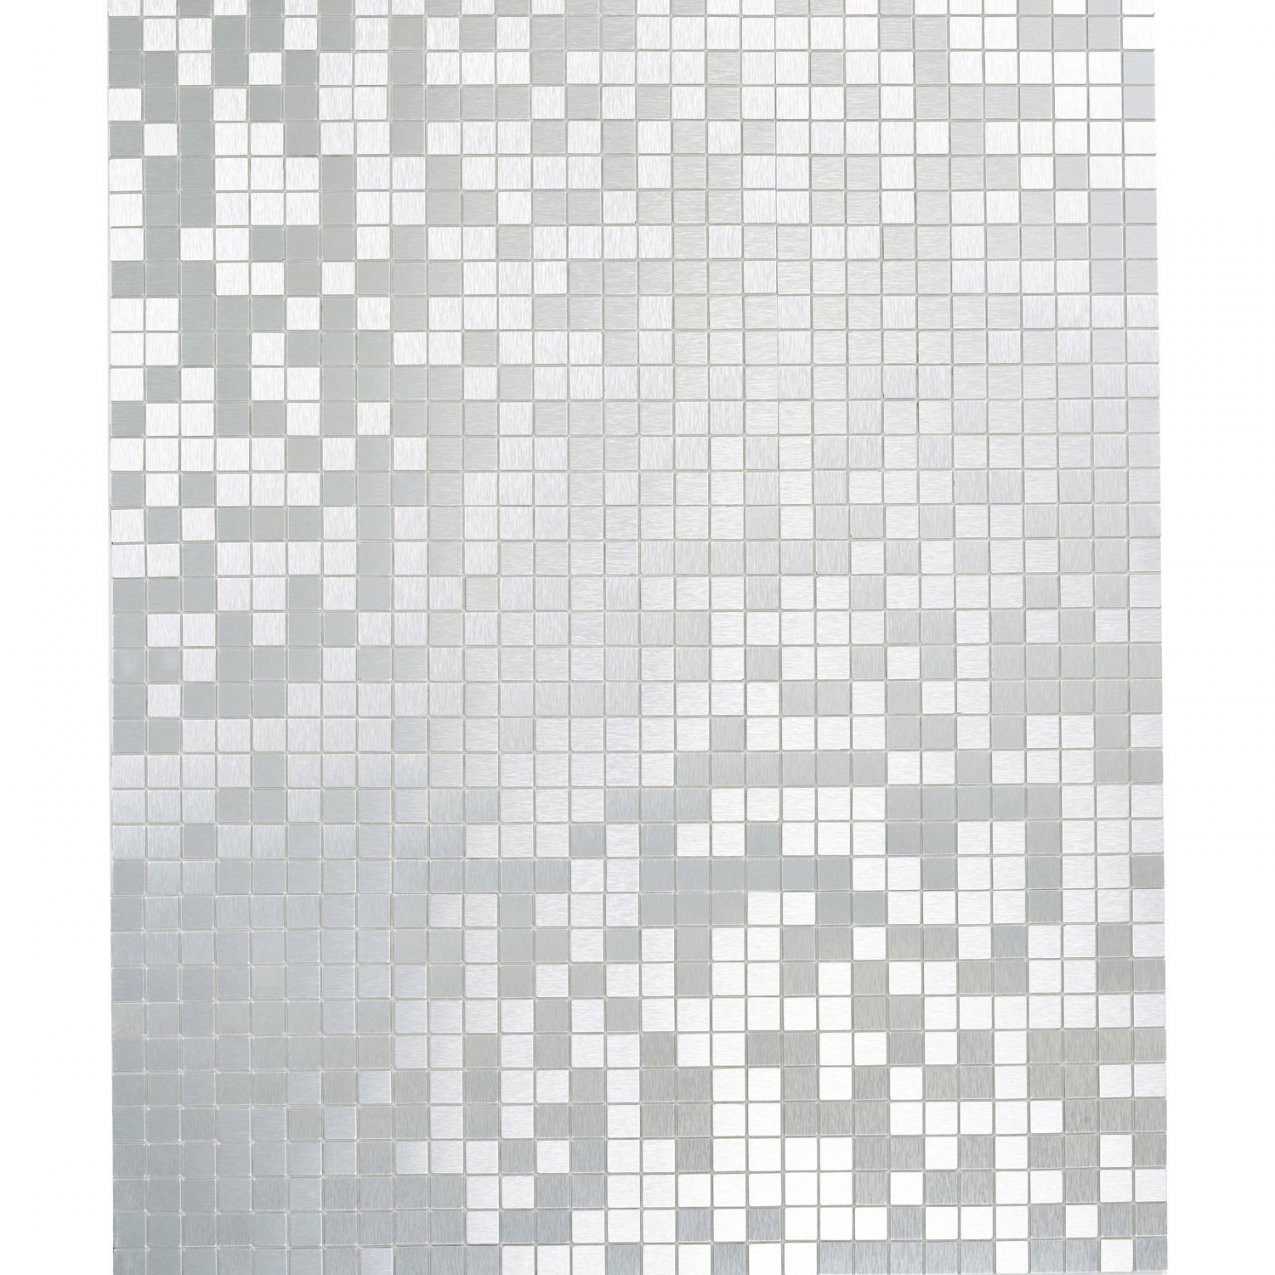 Kuche Obi Interesting Pvc Boden Obi Genial Vinylboden Fr Kche Obi von Hornbach Mosaik Fliesen Photo